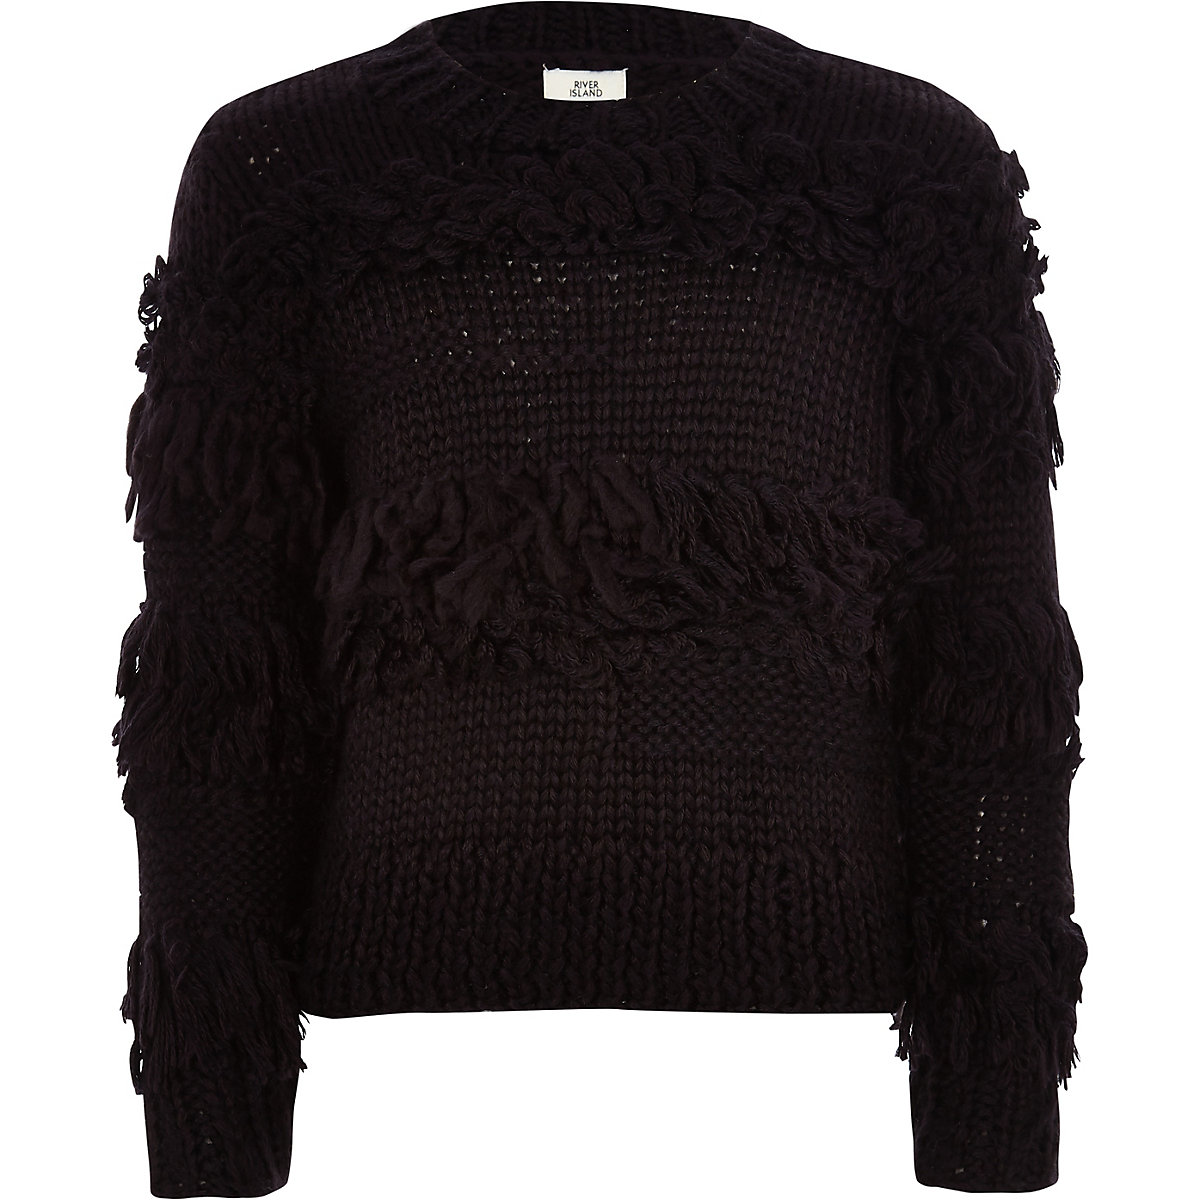 Girls black fringe trim hand knitted sweater